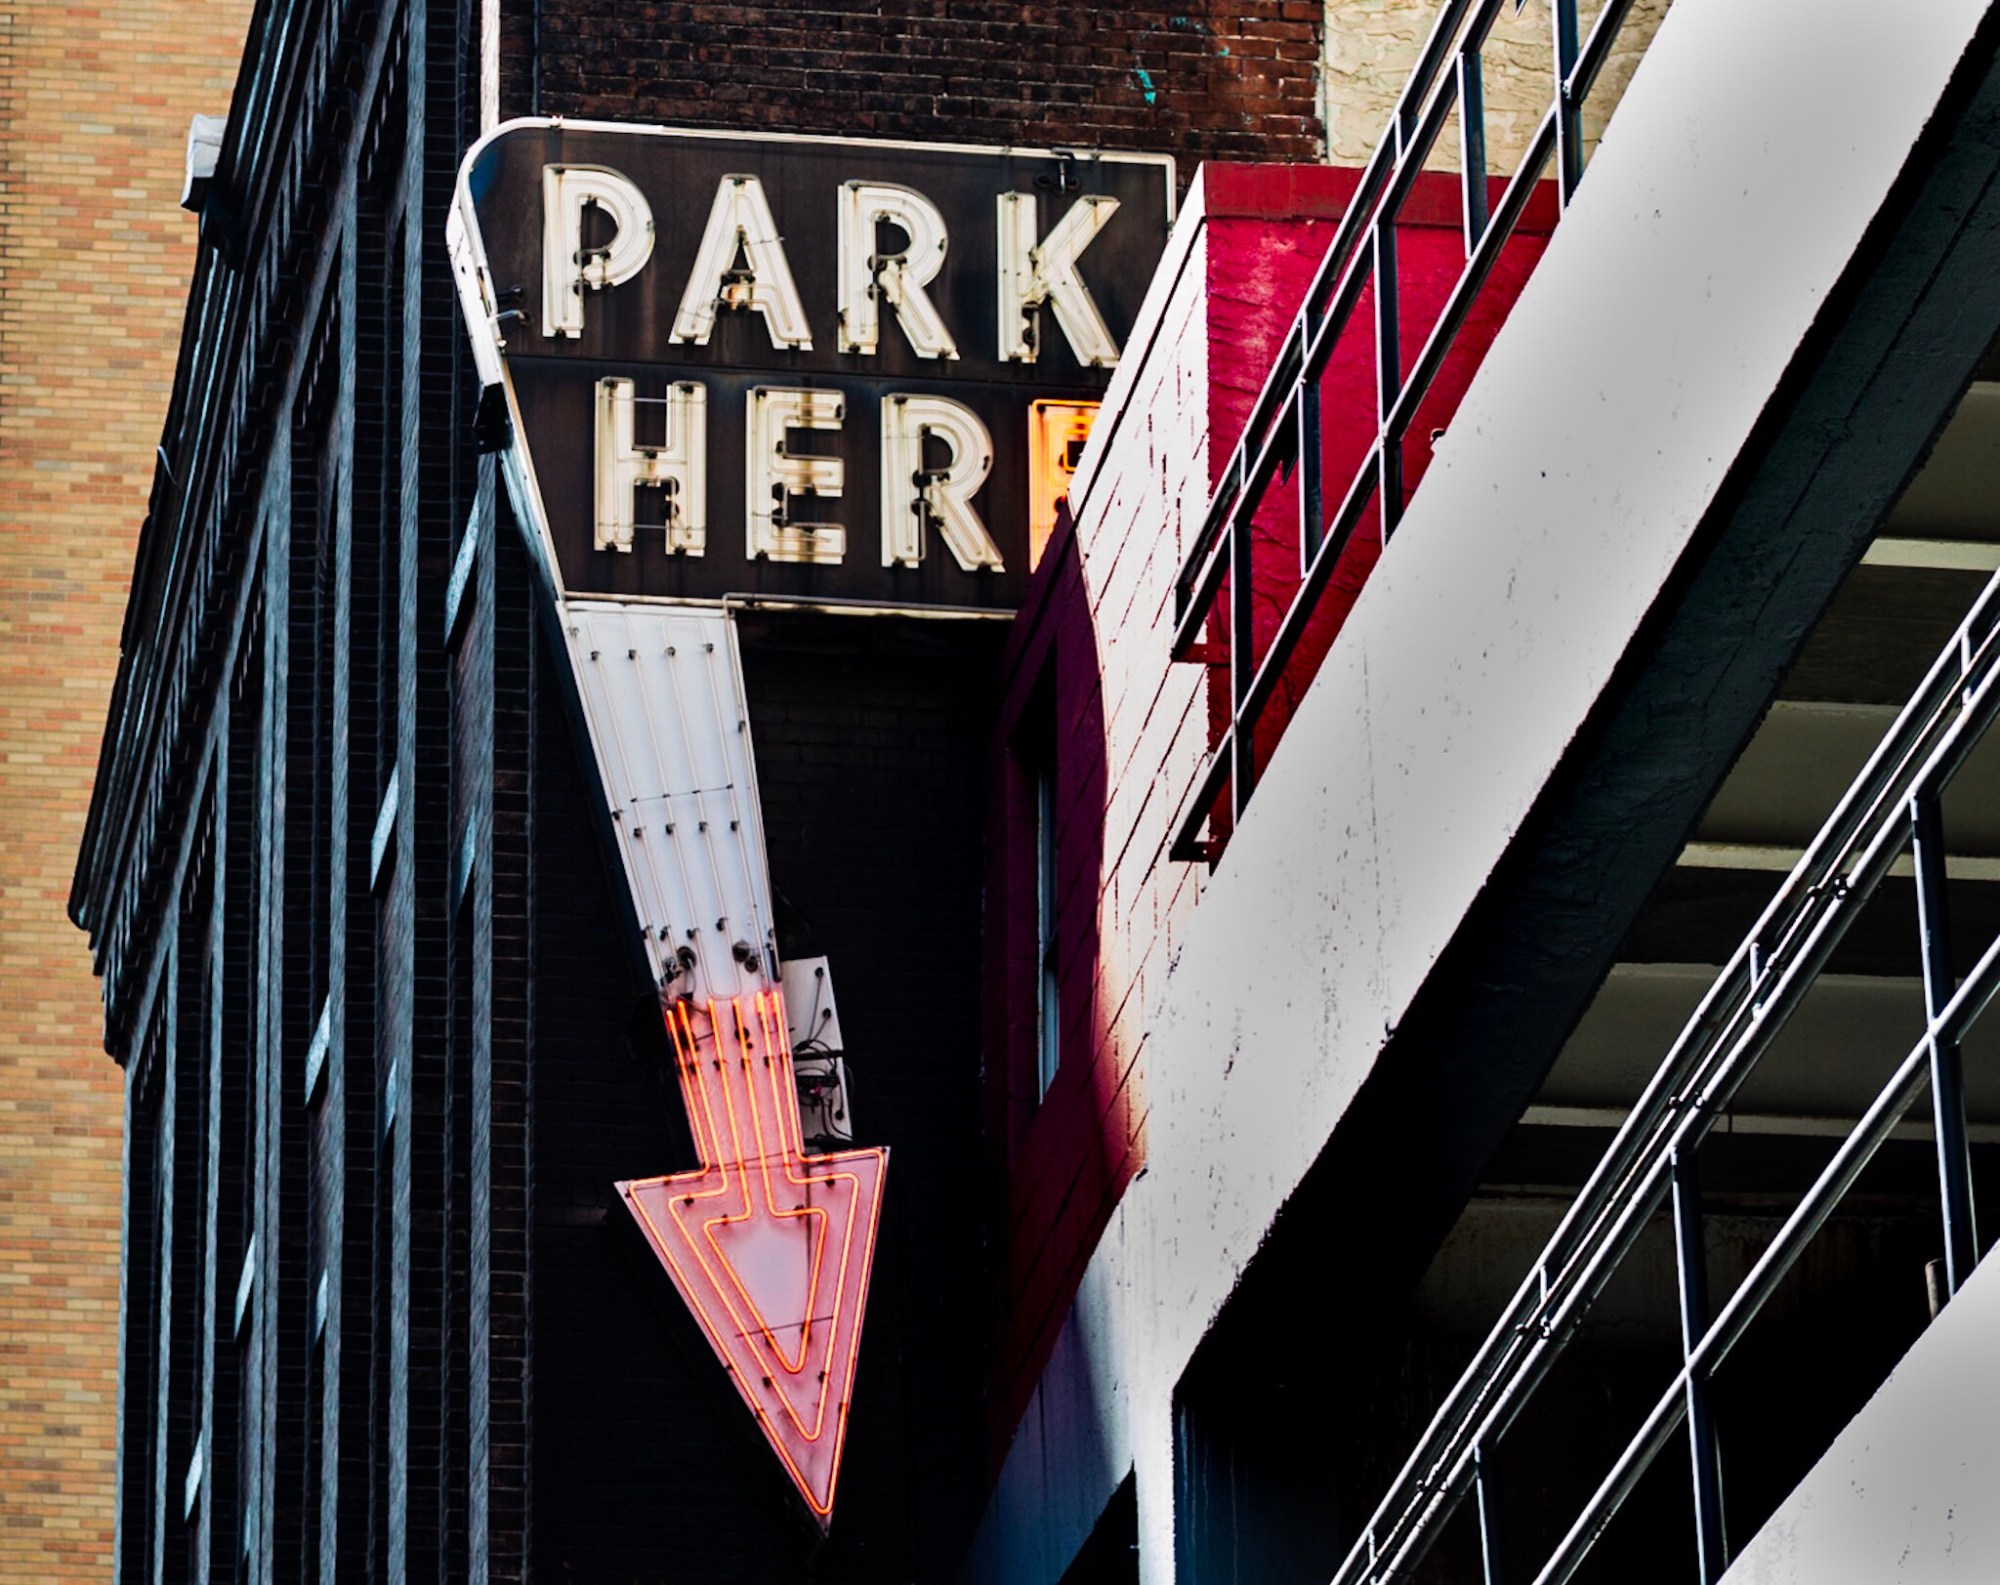 Park Here